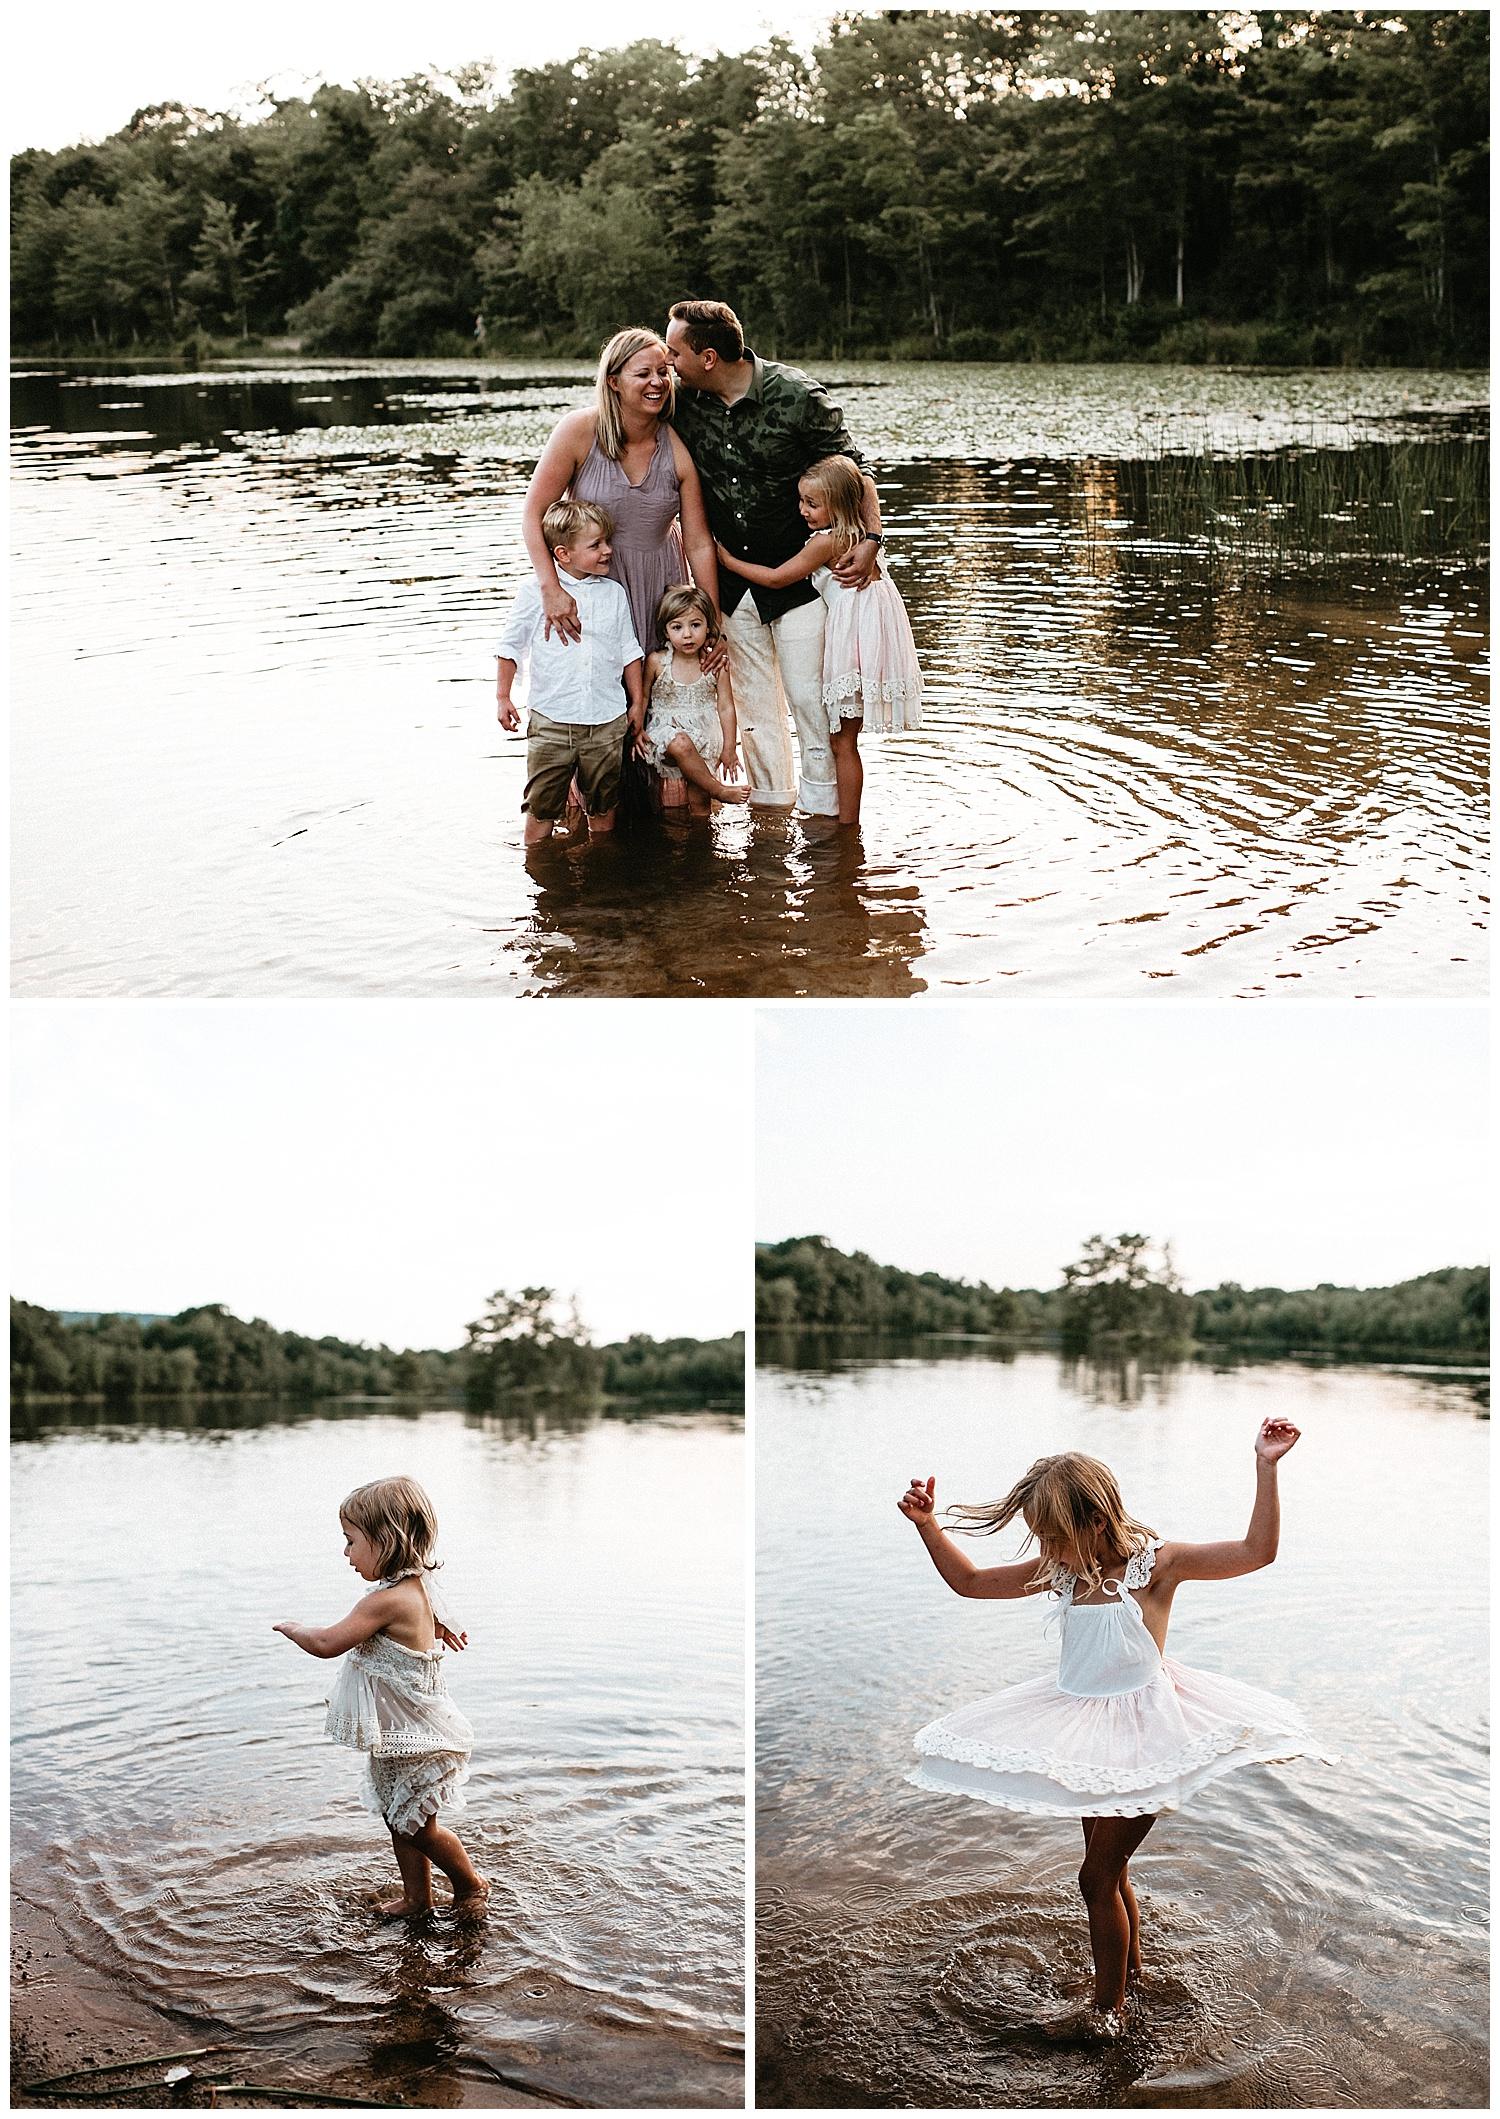 NEPA-Family-Photographer-in-Wilkes-Barre-PA_0174.jpg